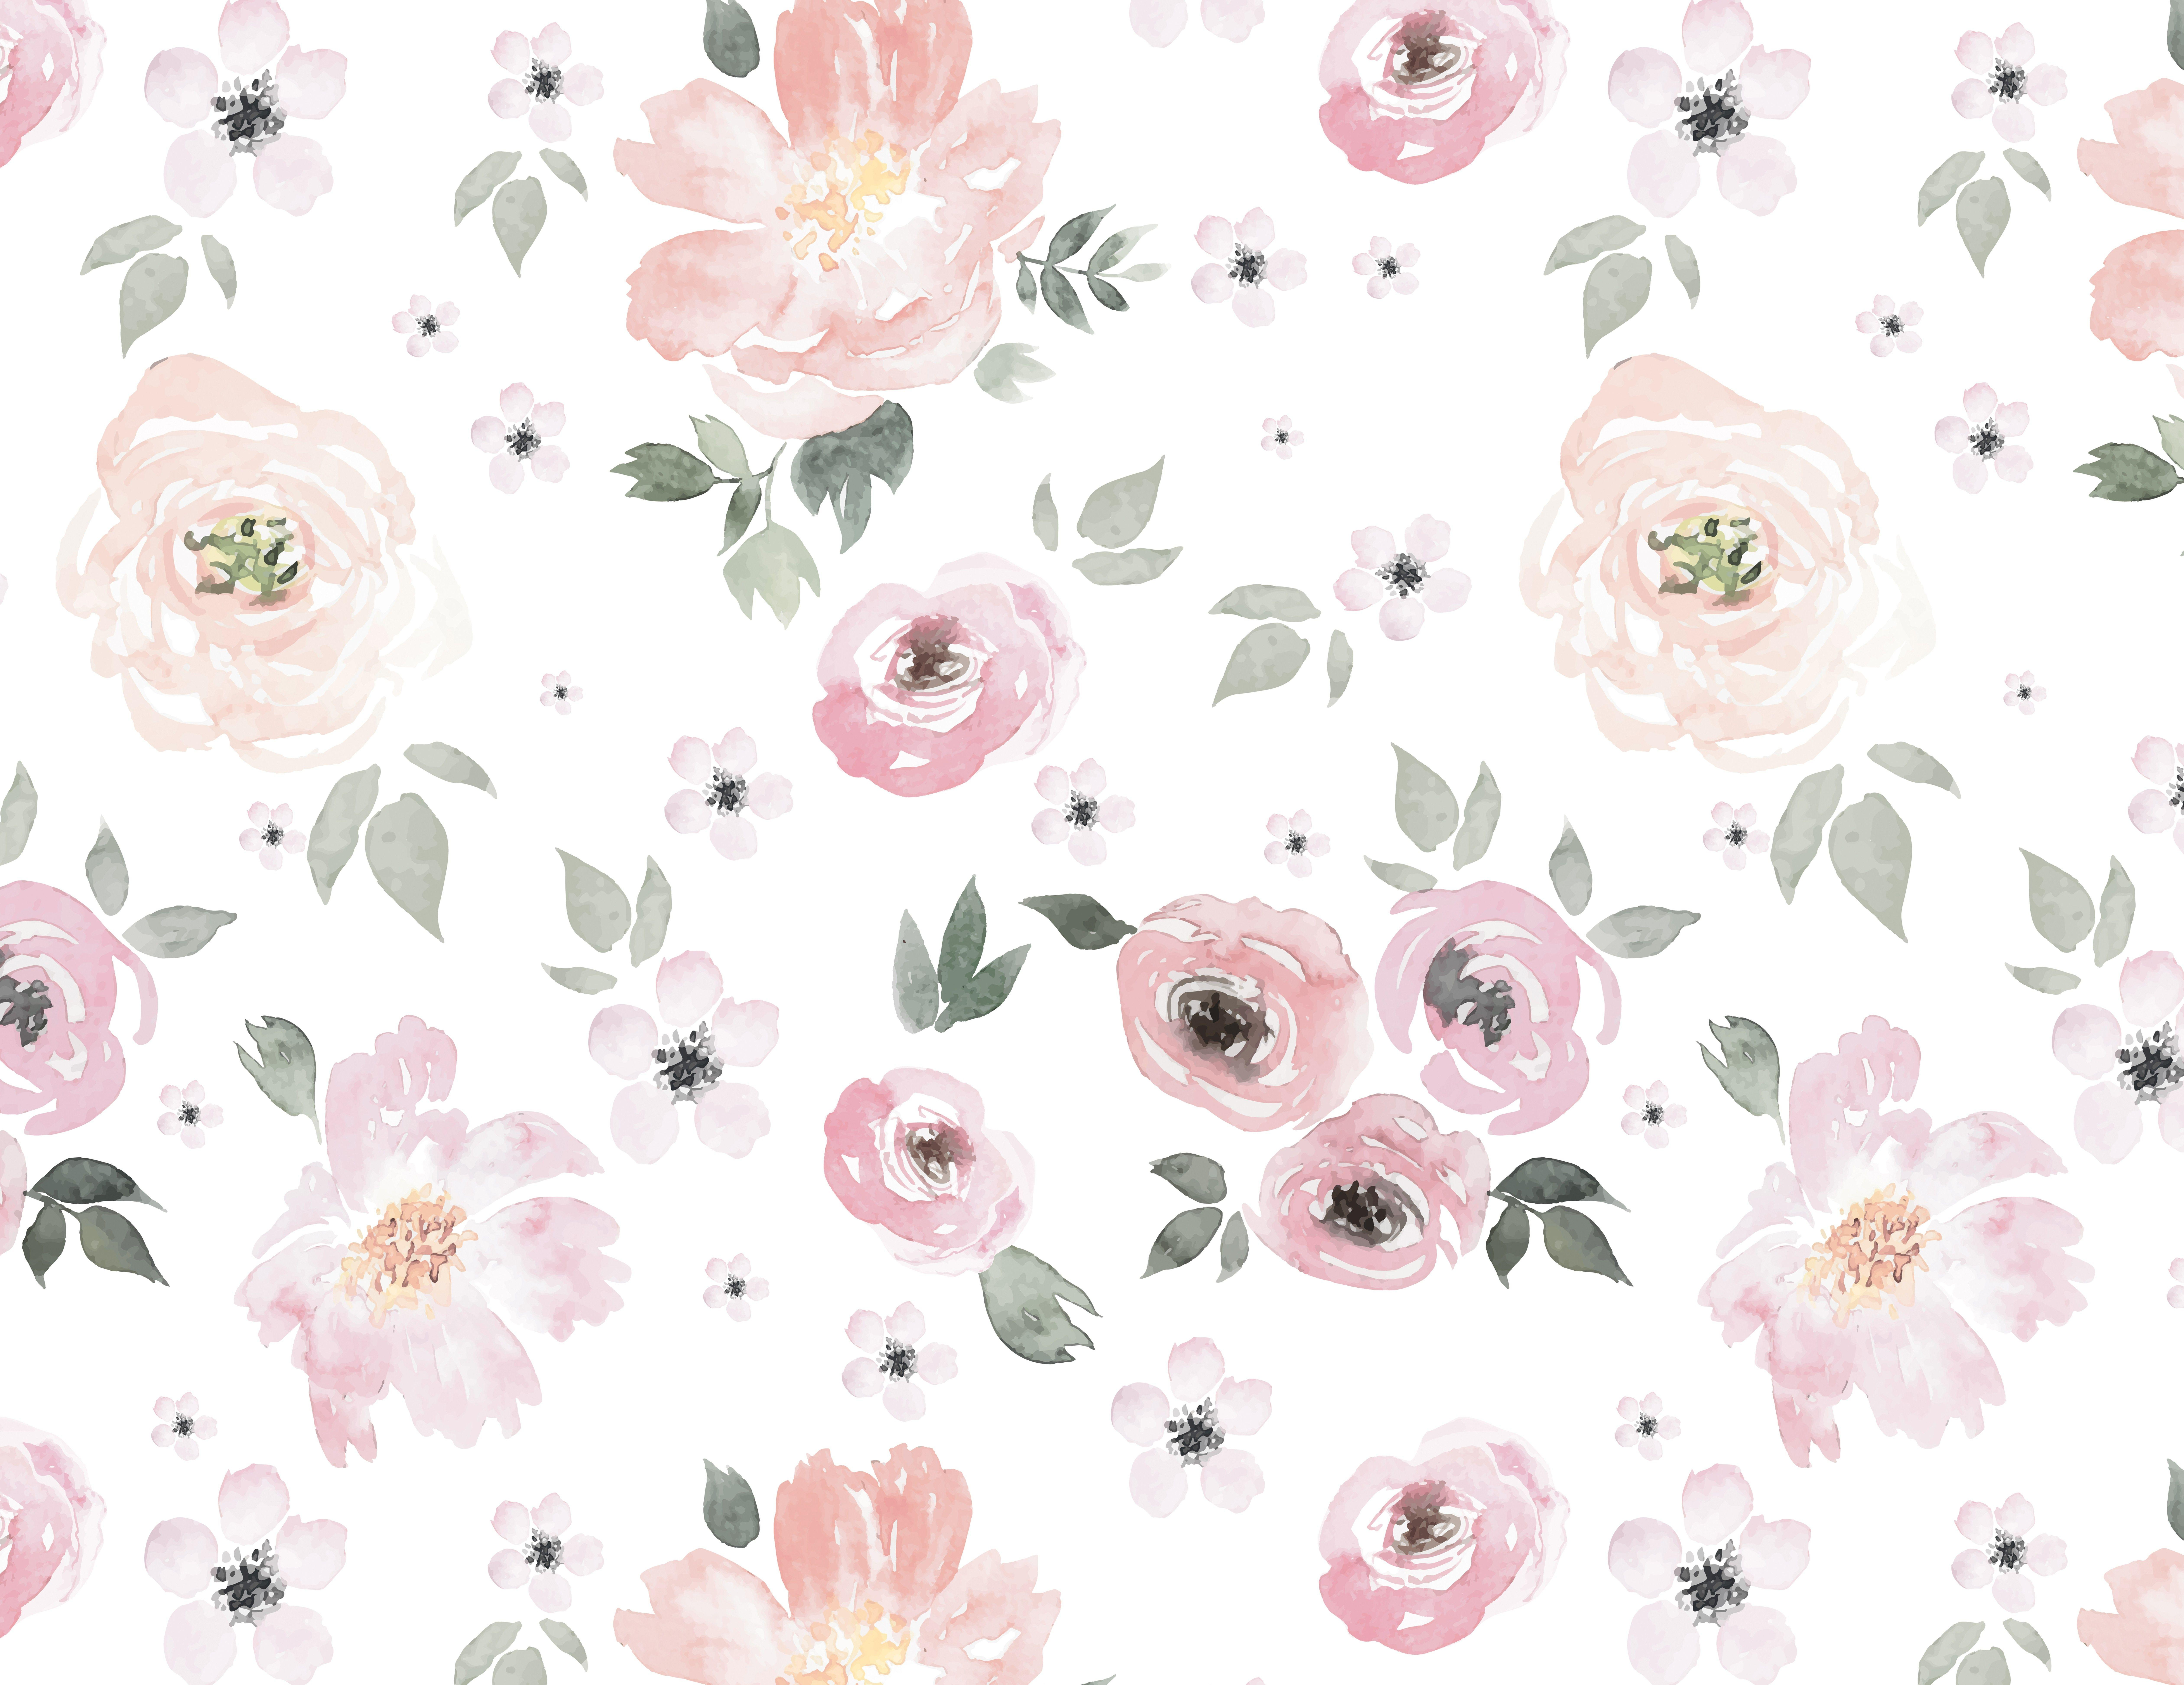 Anewall Jolie Wallpaper Mural Vintage floral wallpapers